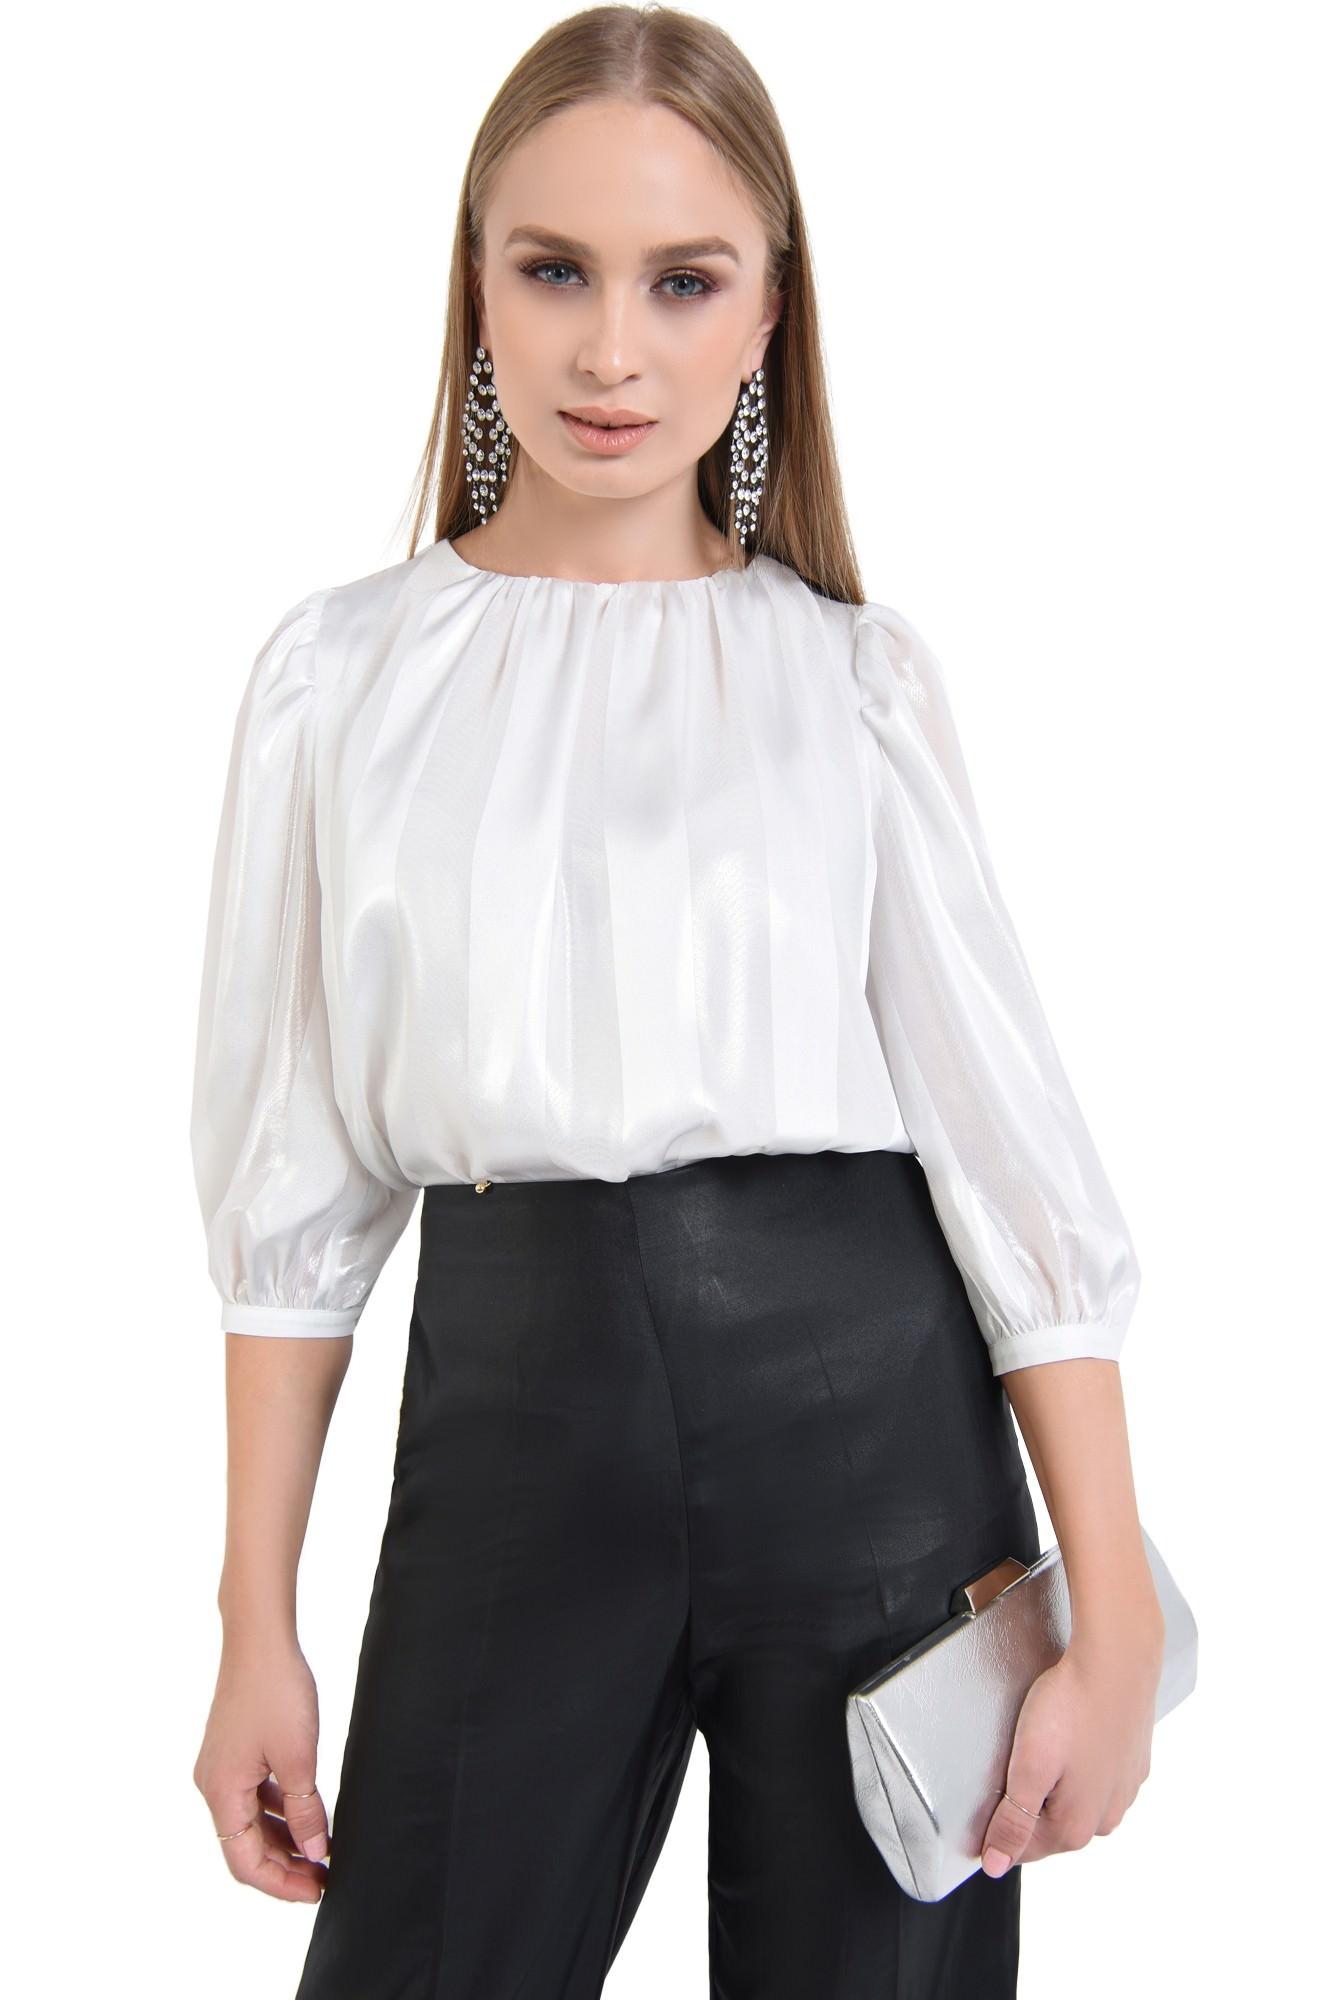 0 - pantaloni eleganti, negri, cu aspect metalic